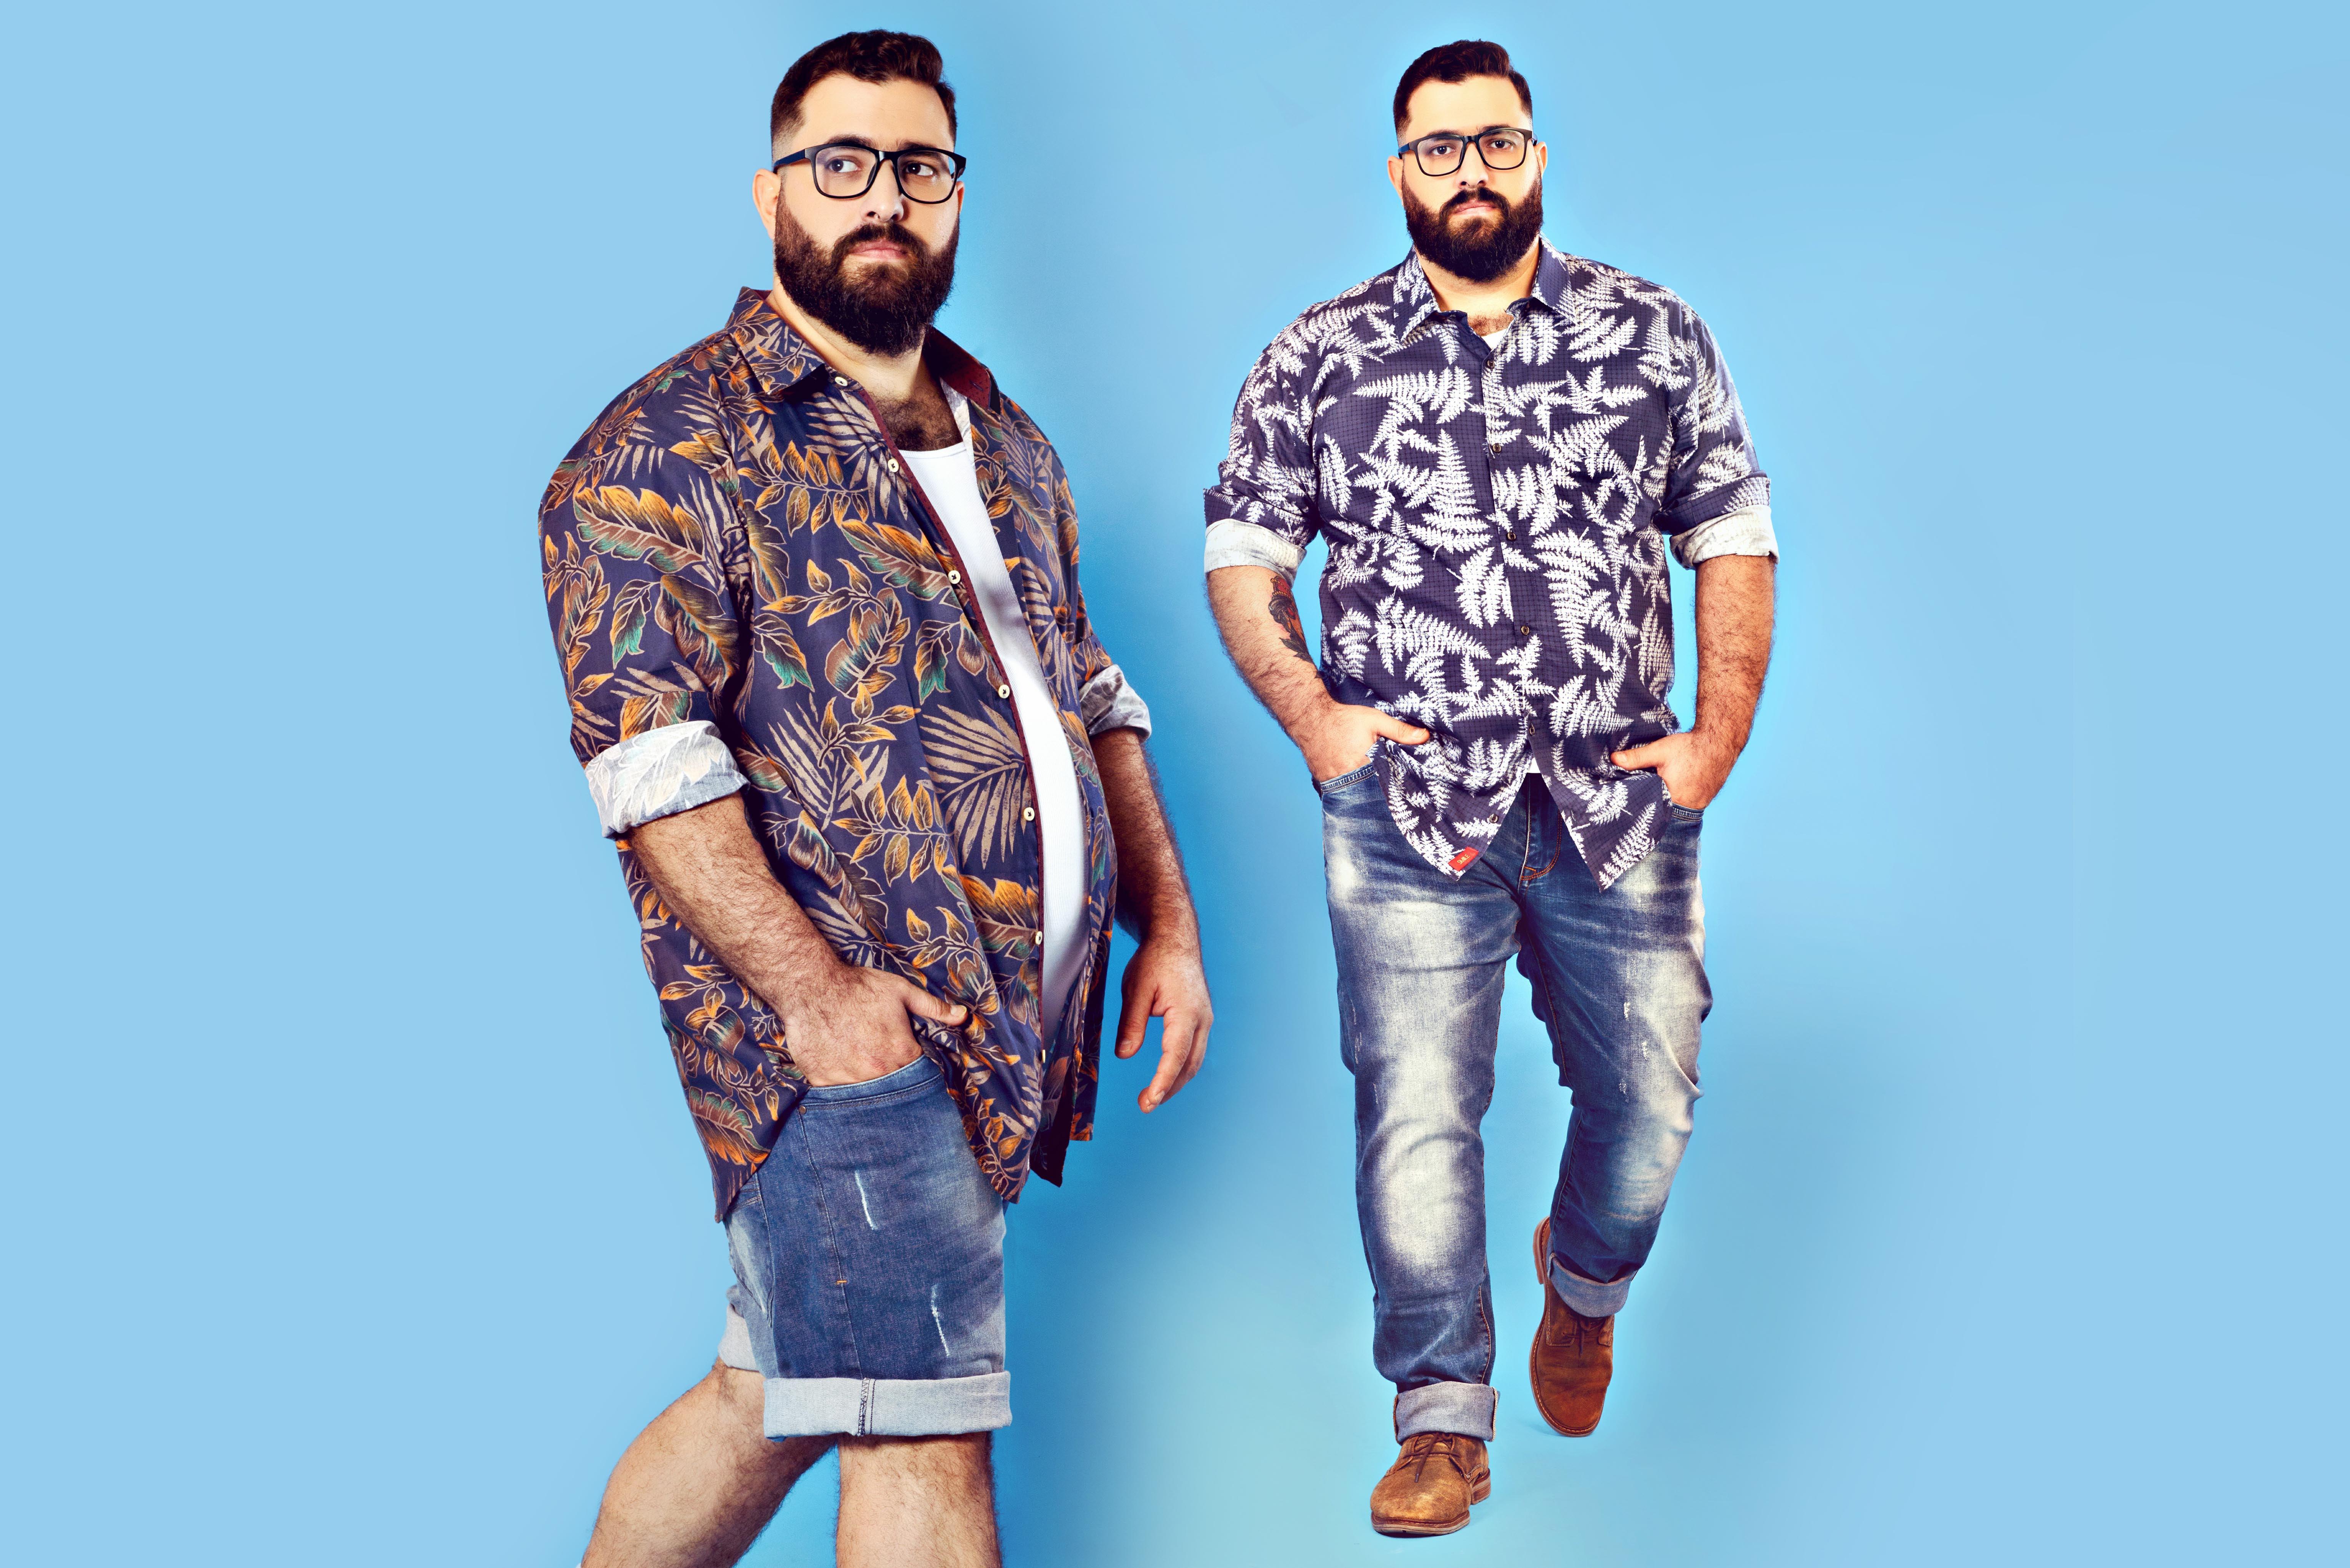 f0bd2471533785 Conheça 4 modelos plus size masculino brasileiros - MODA SEM CENSURA ...